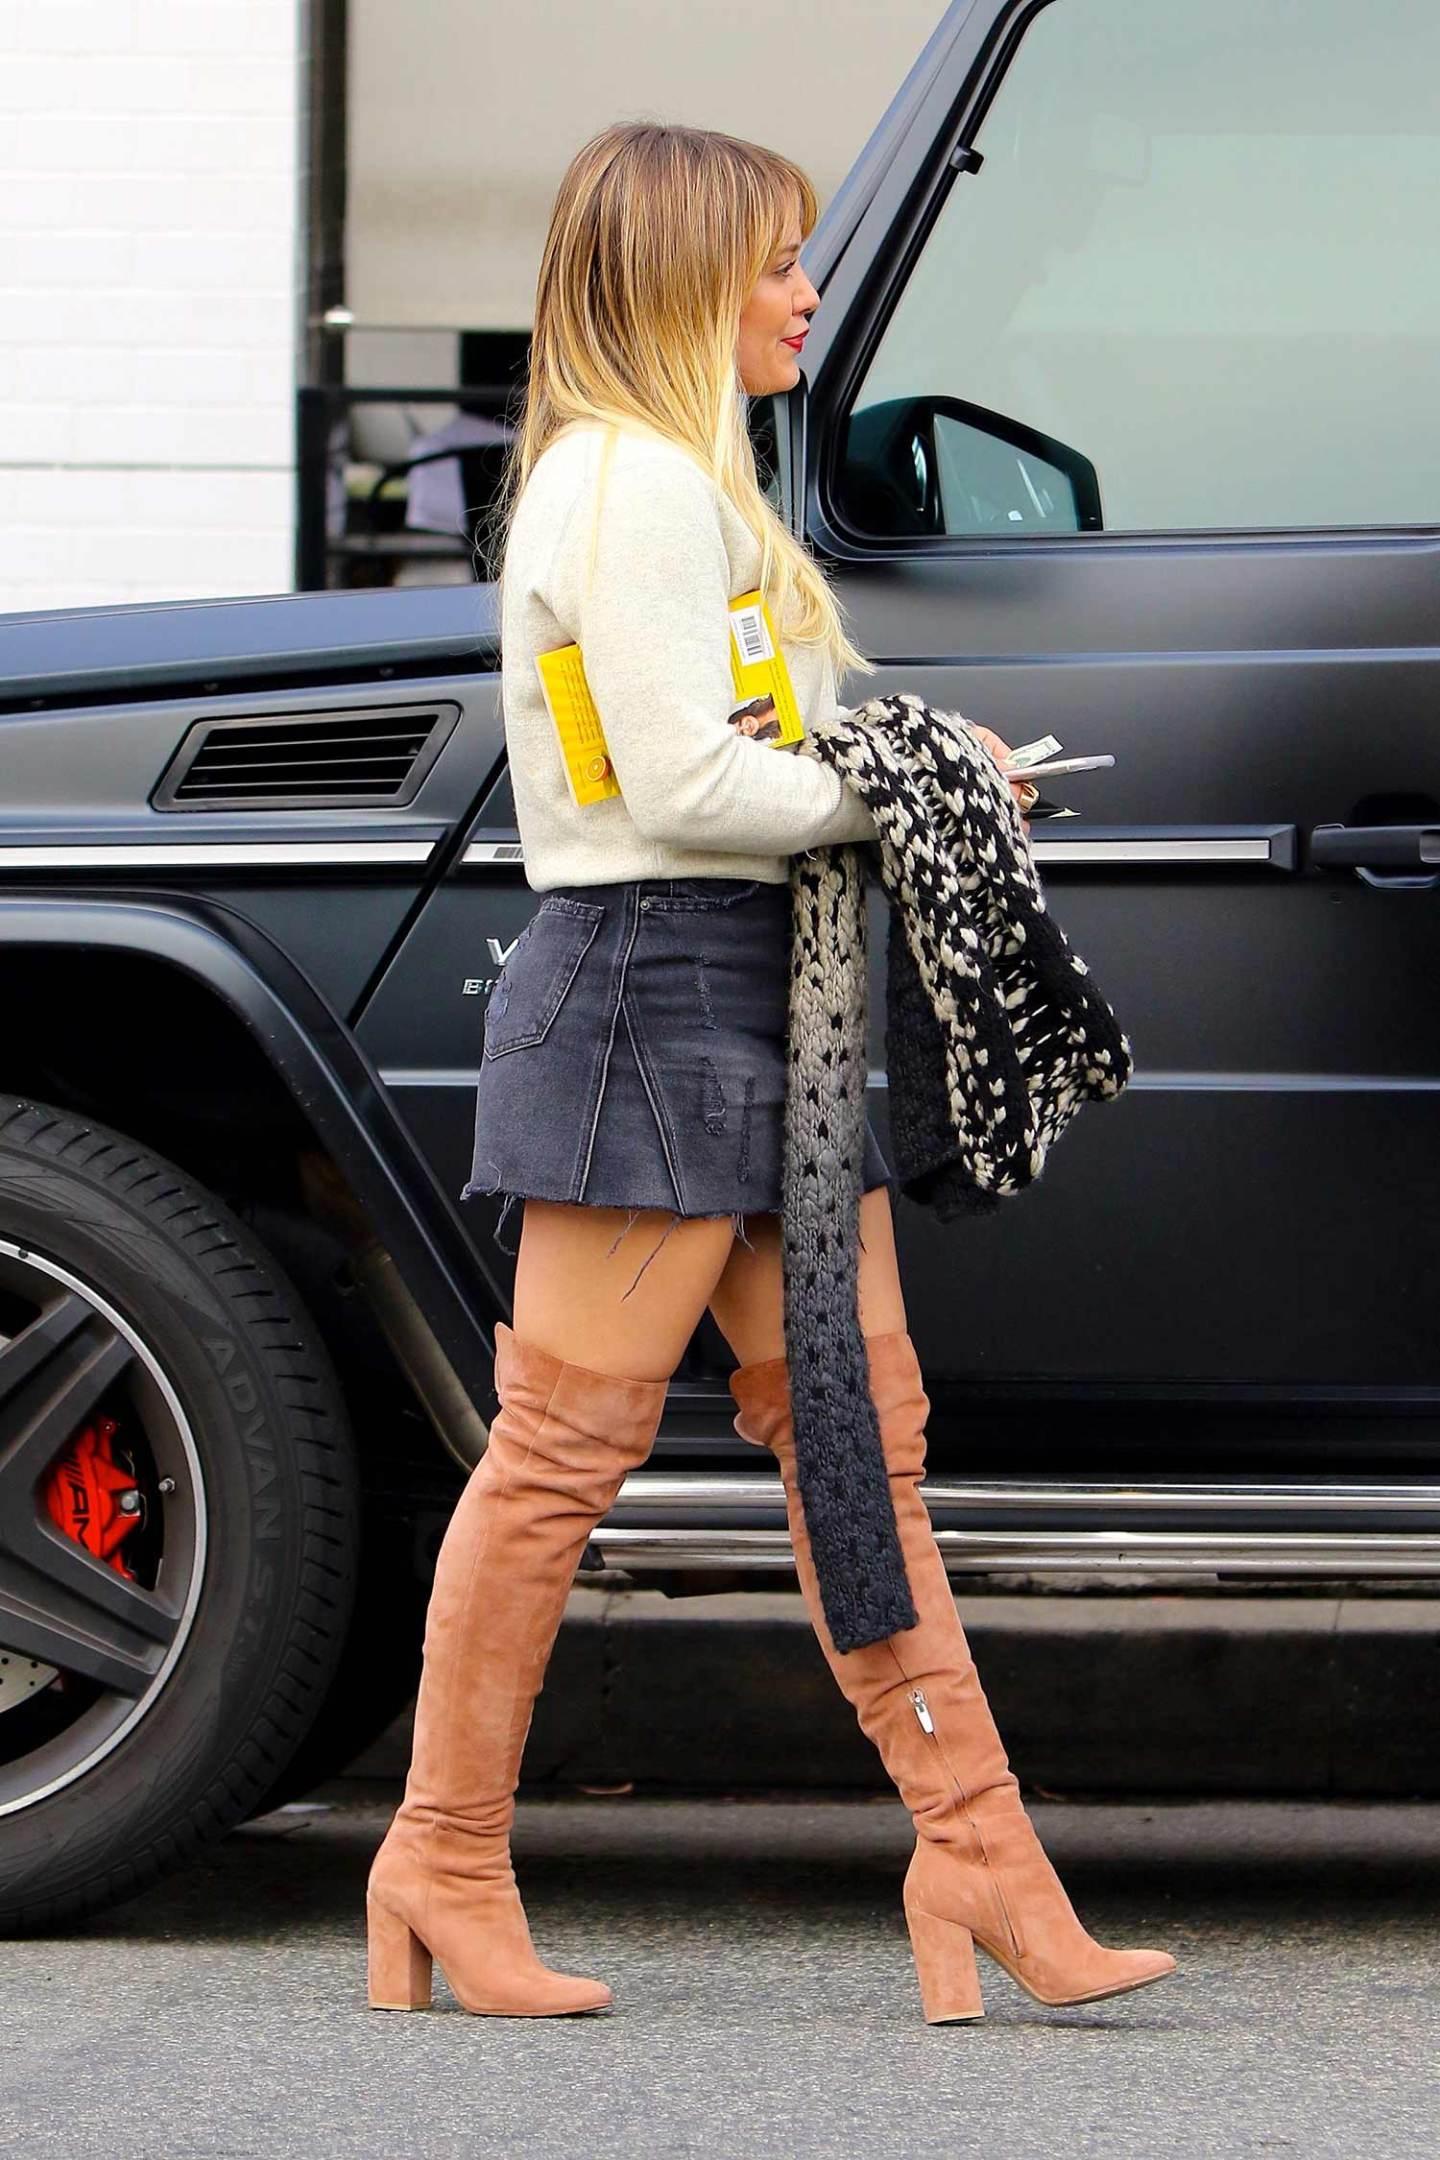 hilary-duff-denim-mini-skirt-thigh-high-boots